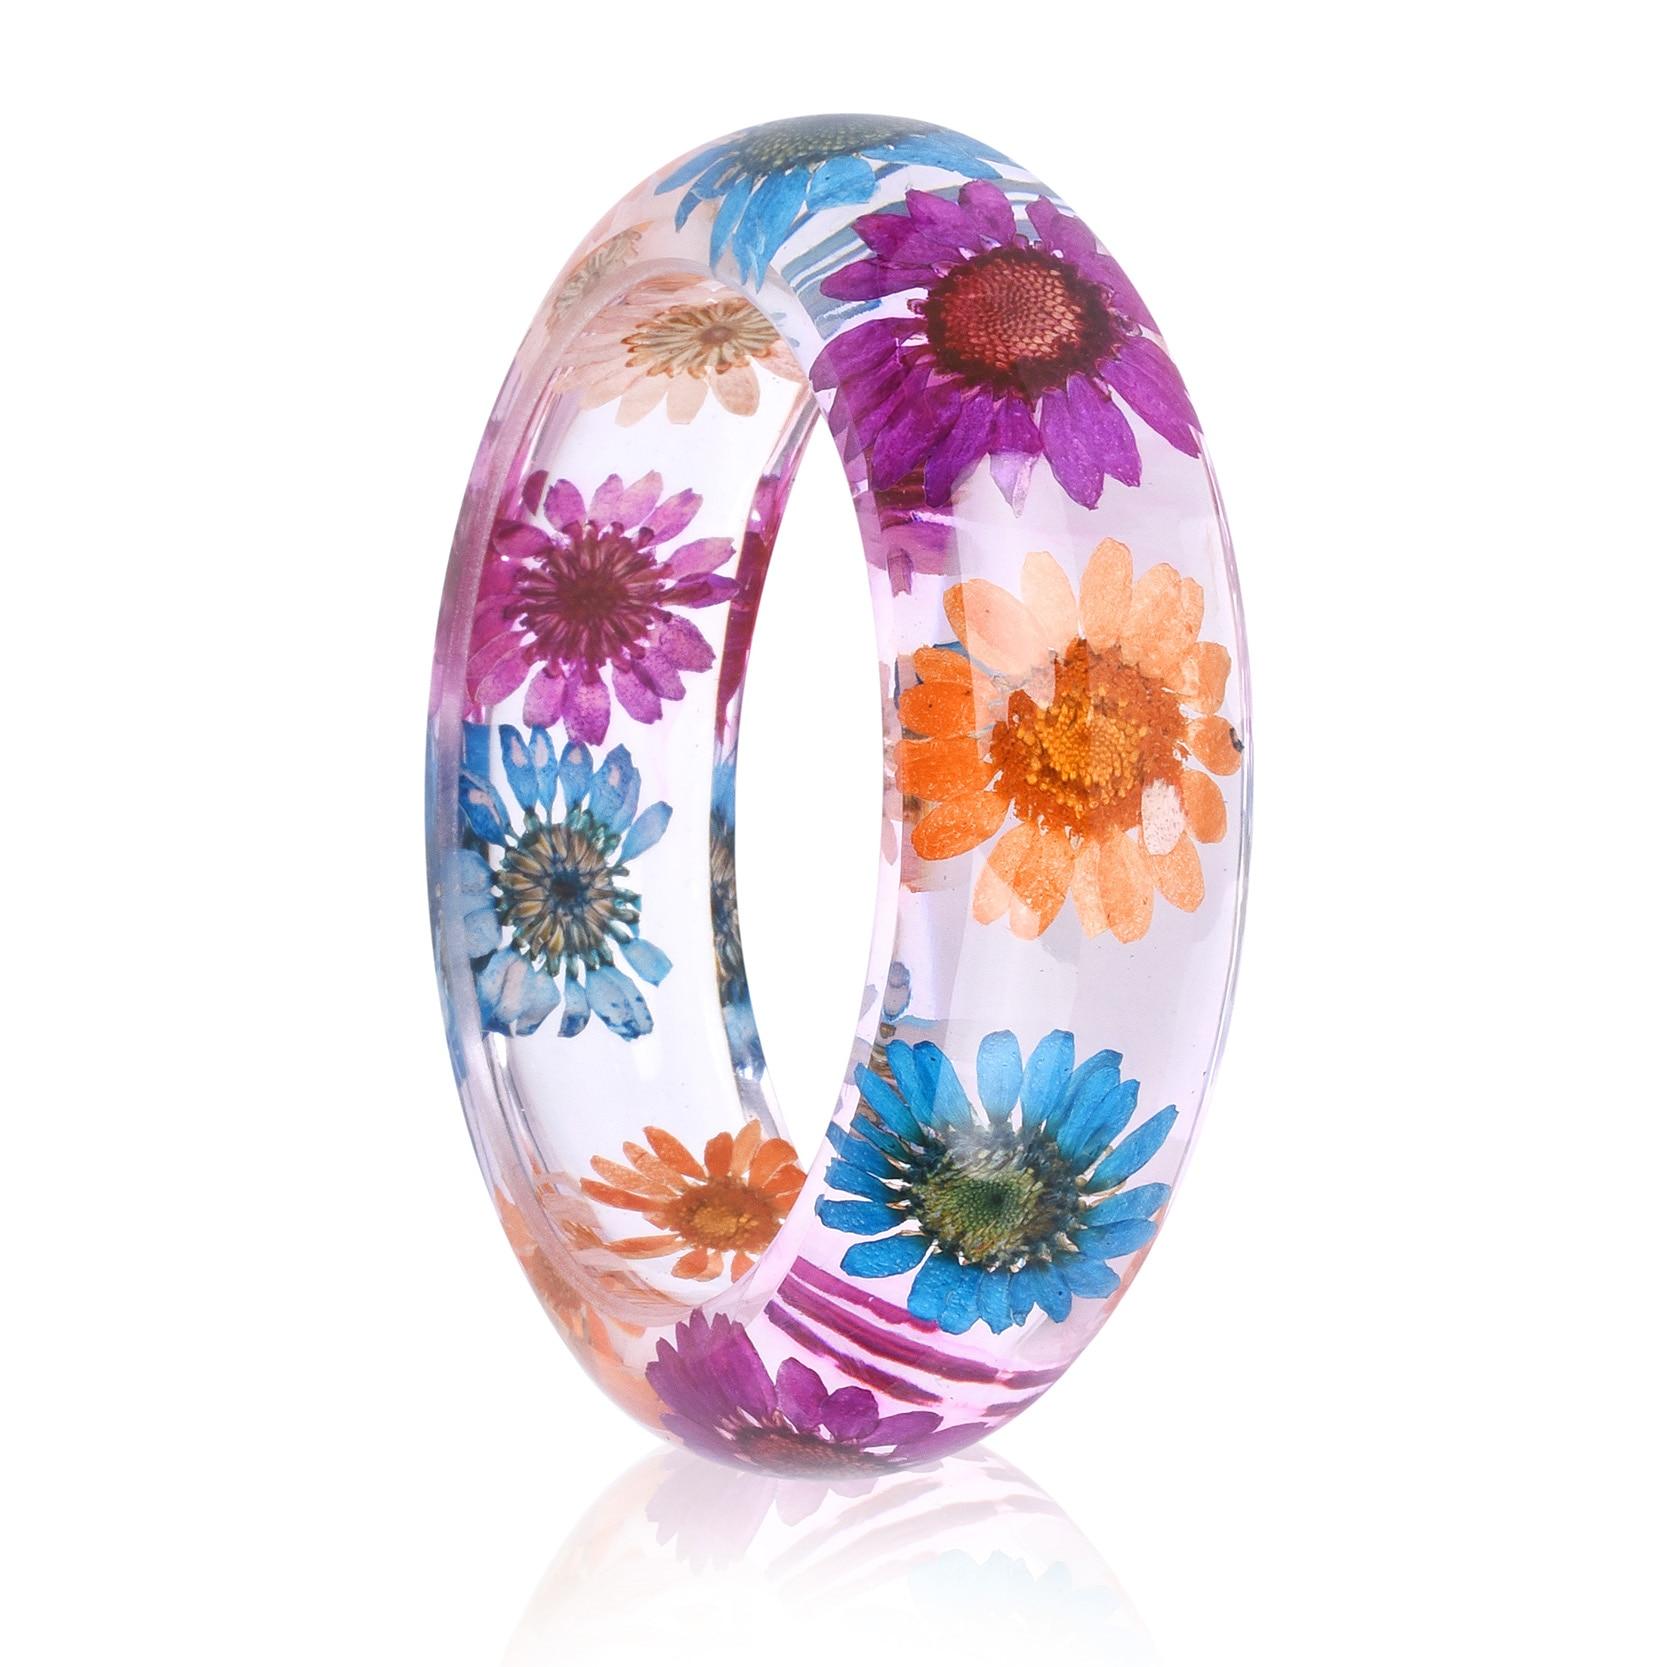 KCALOE Dried Flower Resin Bangles Bracelet For Women Three-color Crystal Chrysanthemum Inside Vintage Jewelry